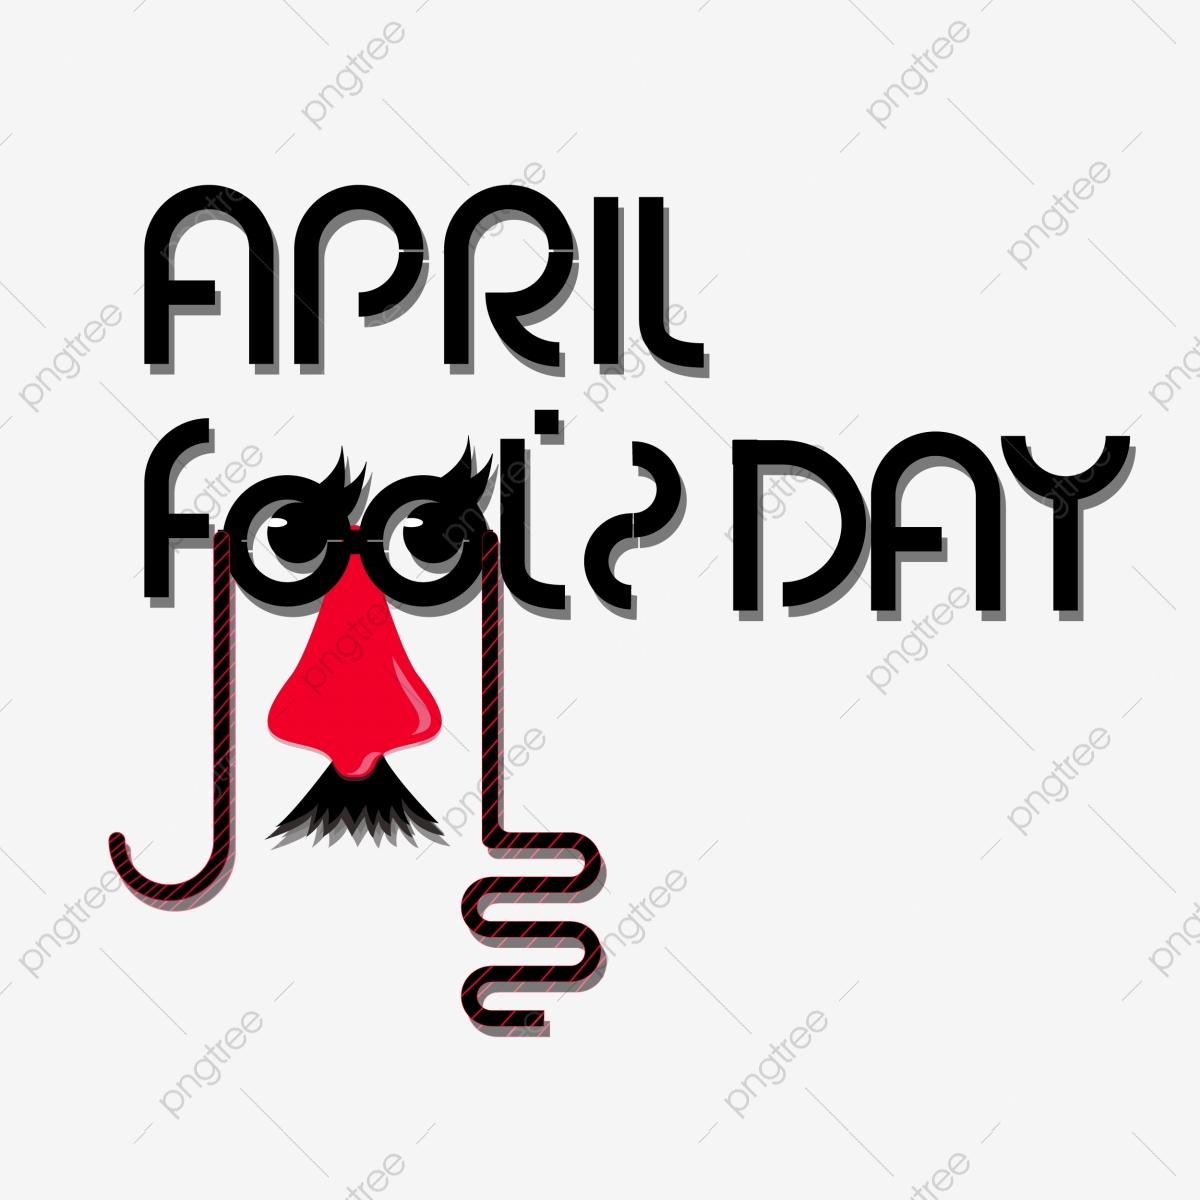 Wordart April Fools Day Theme April Fool`s, Clown Nose, Glasses.